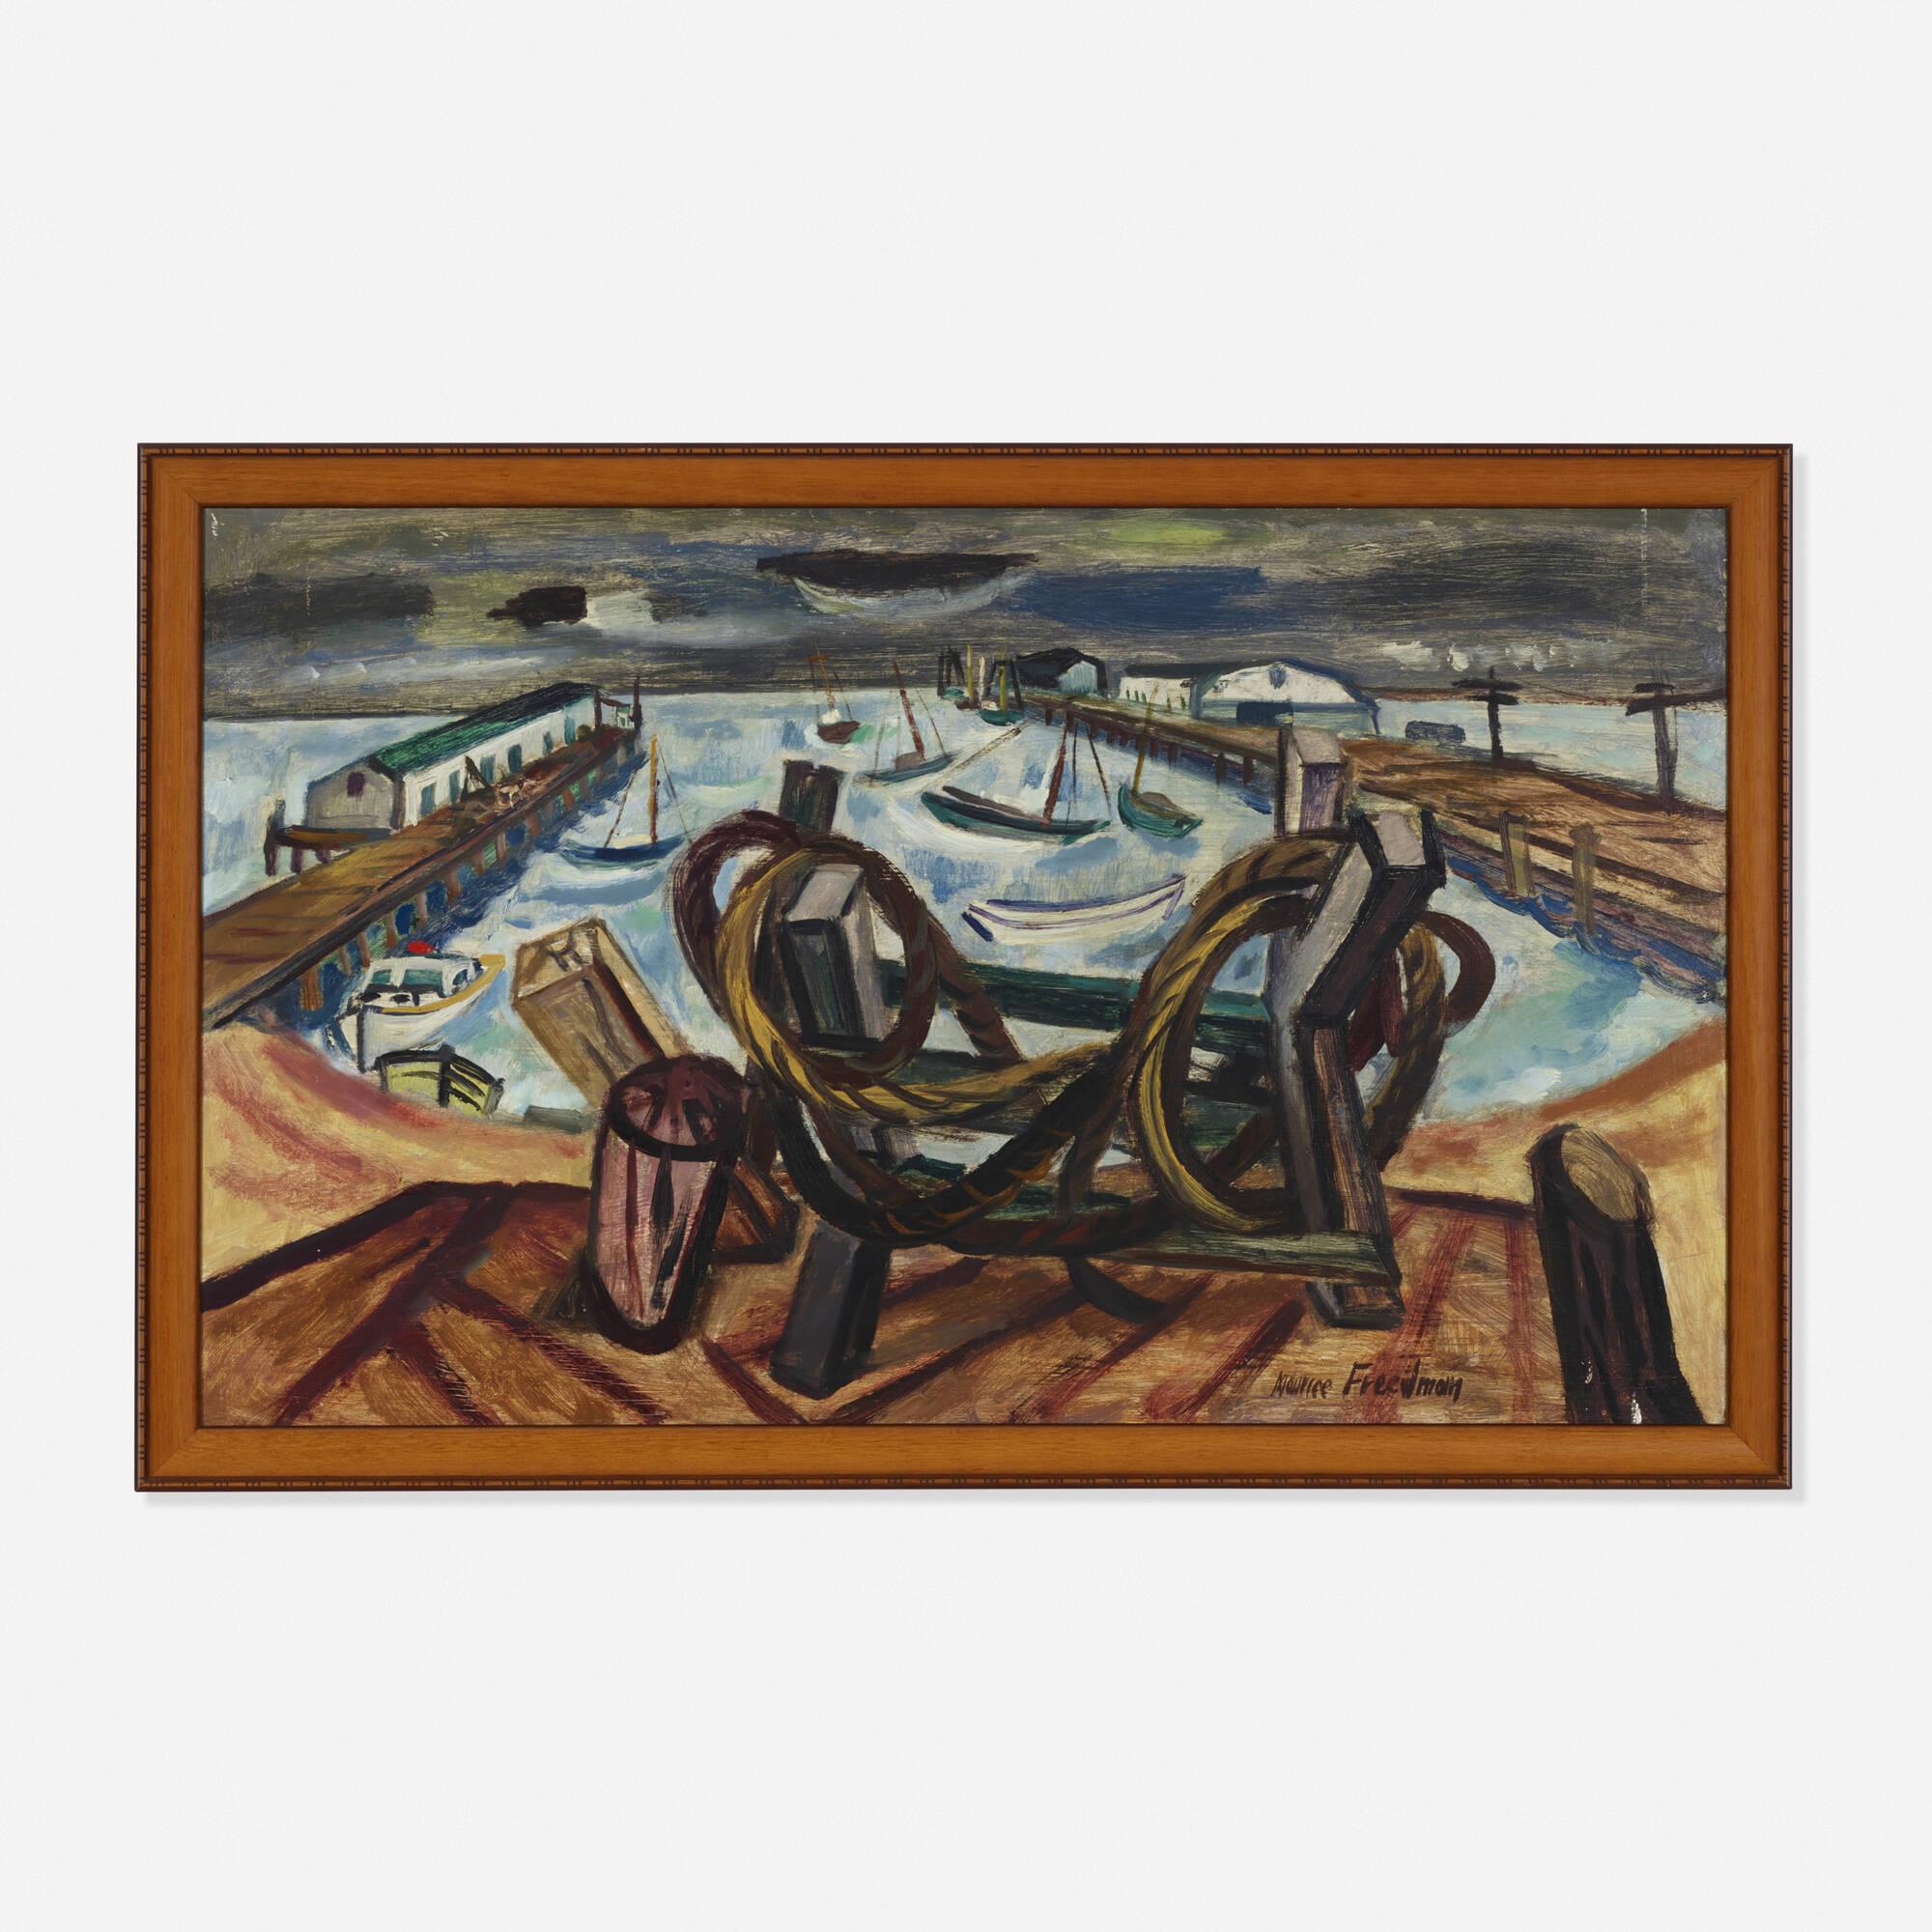 202: Maurice Freedman / Untitled (Harbor) (1 of 2)